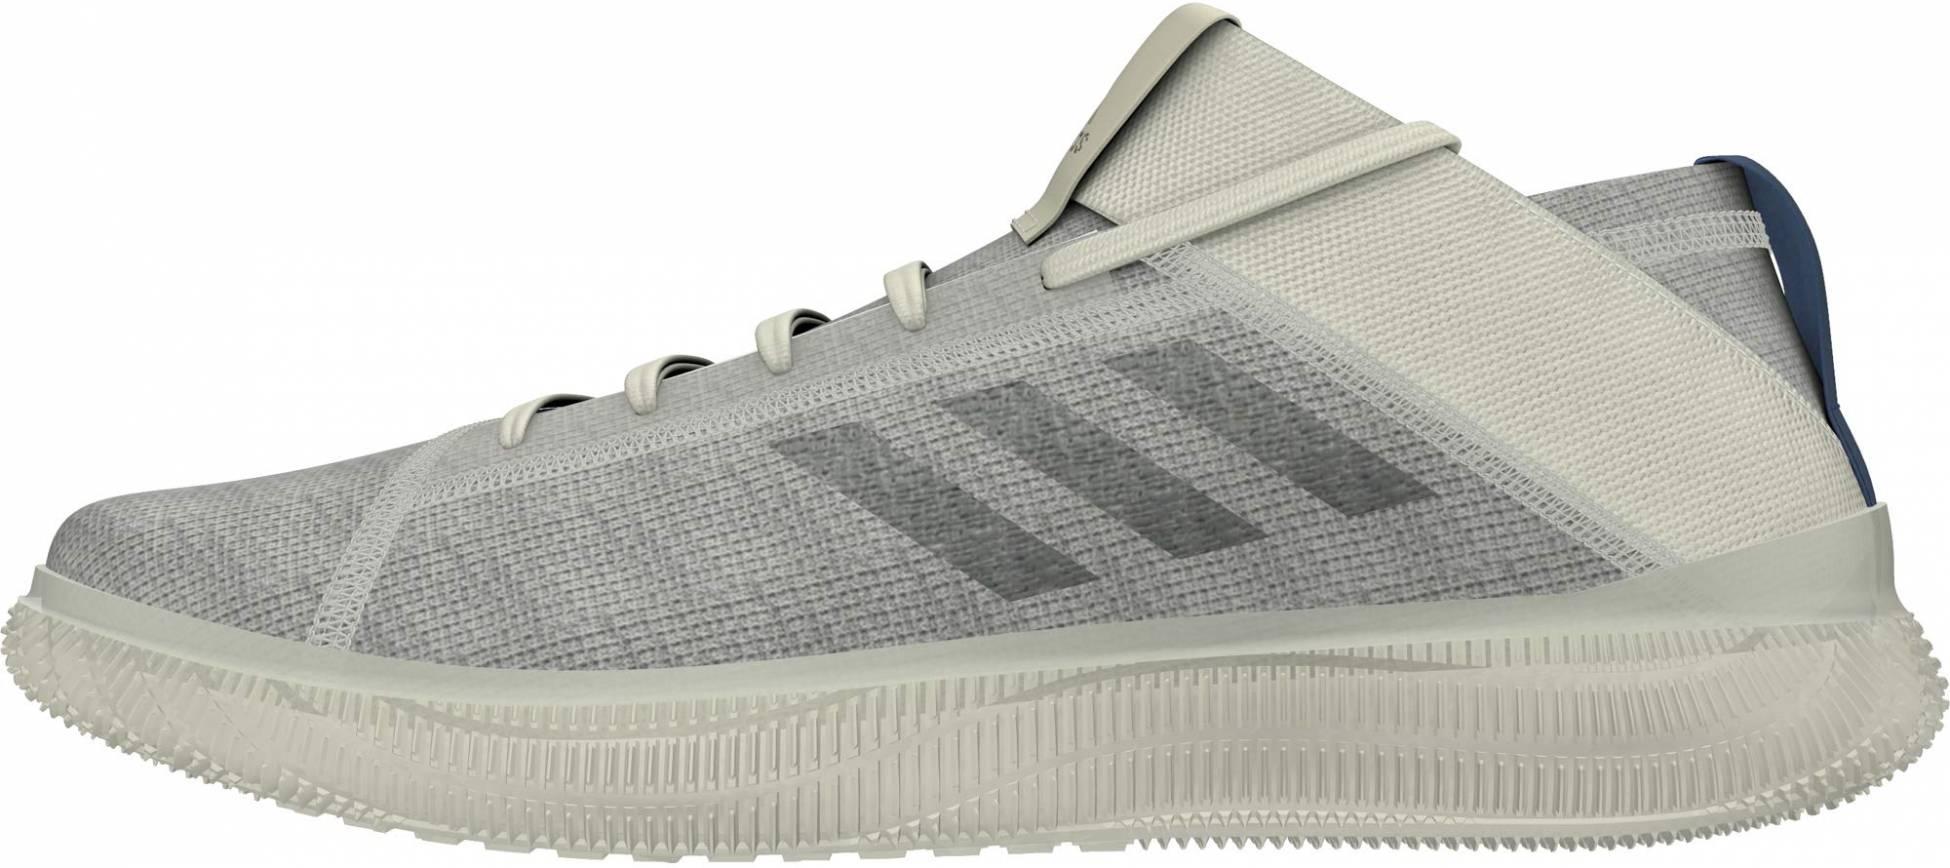 Adidas Pureboost Trainer - Deals ($70), Facts, Reviews (2021 ...